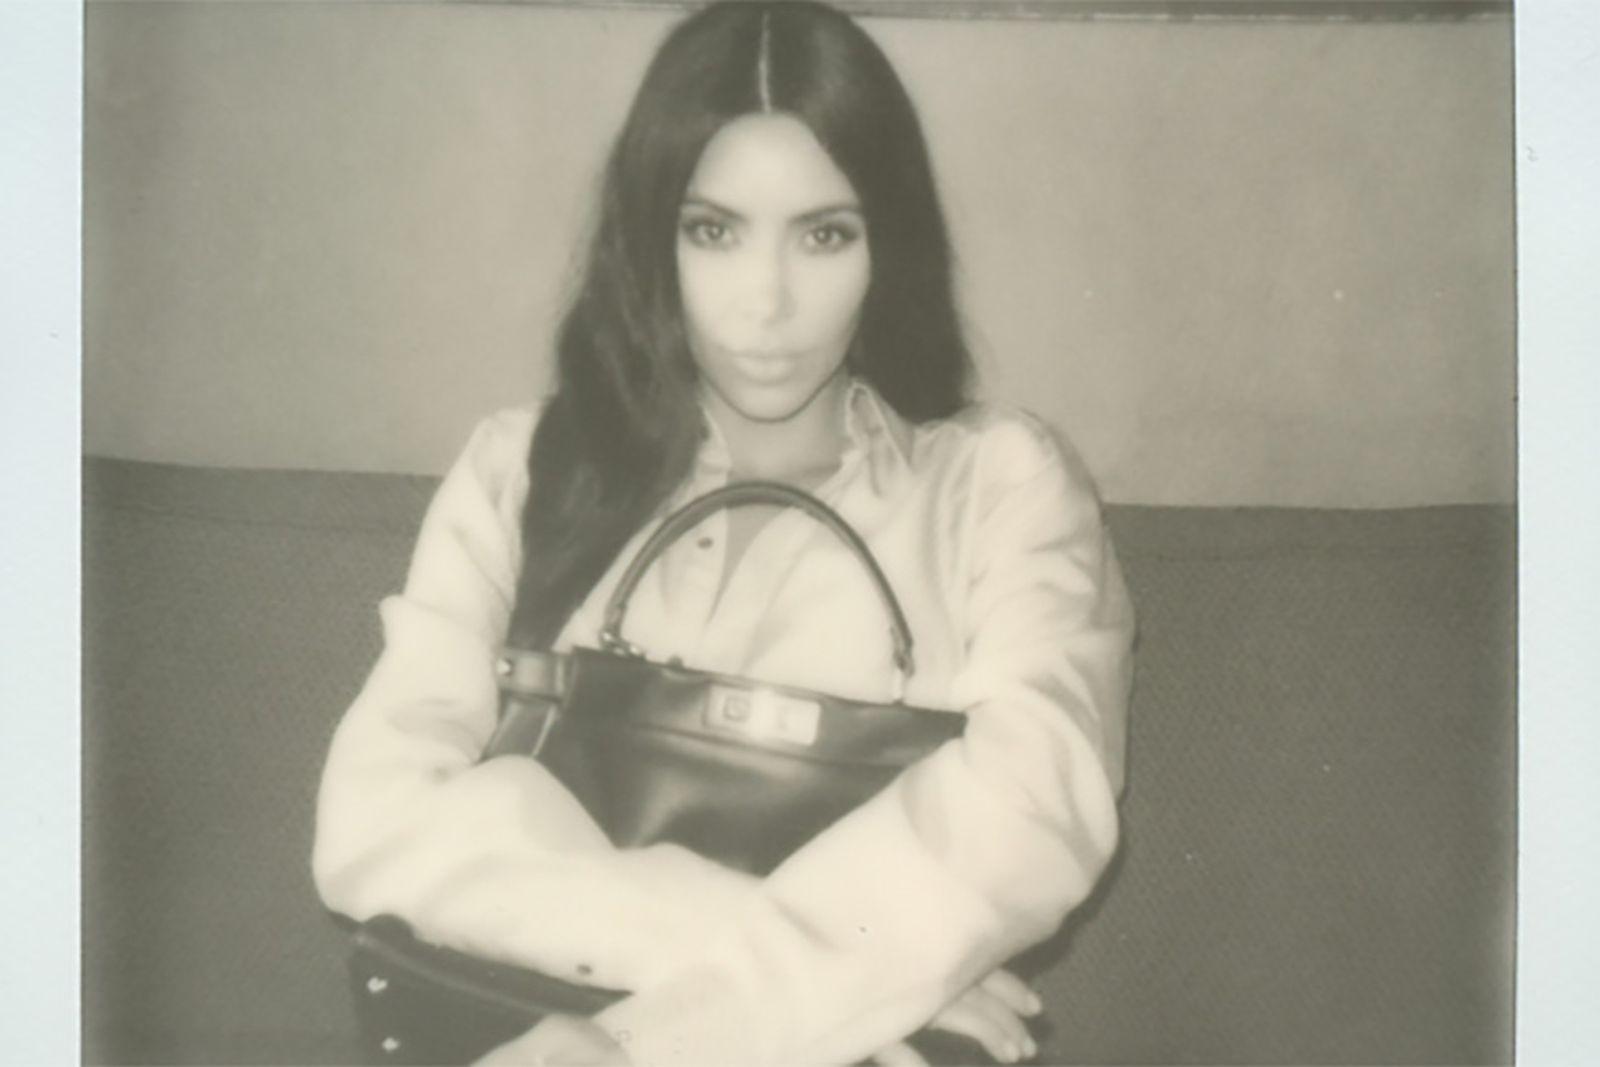 north west fendi campaign kim kardashian Kim Kardashian West Kris Jenner